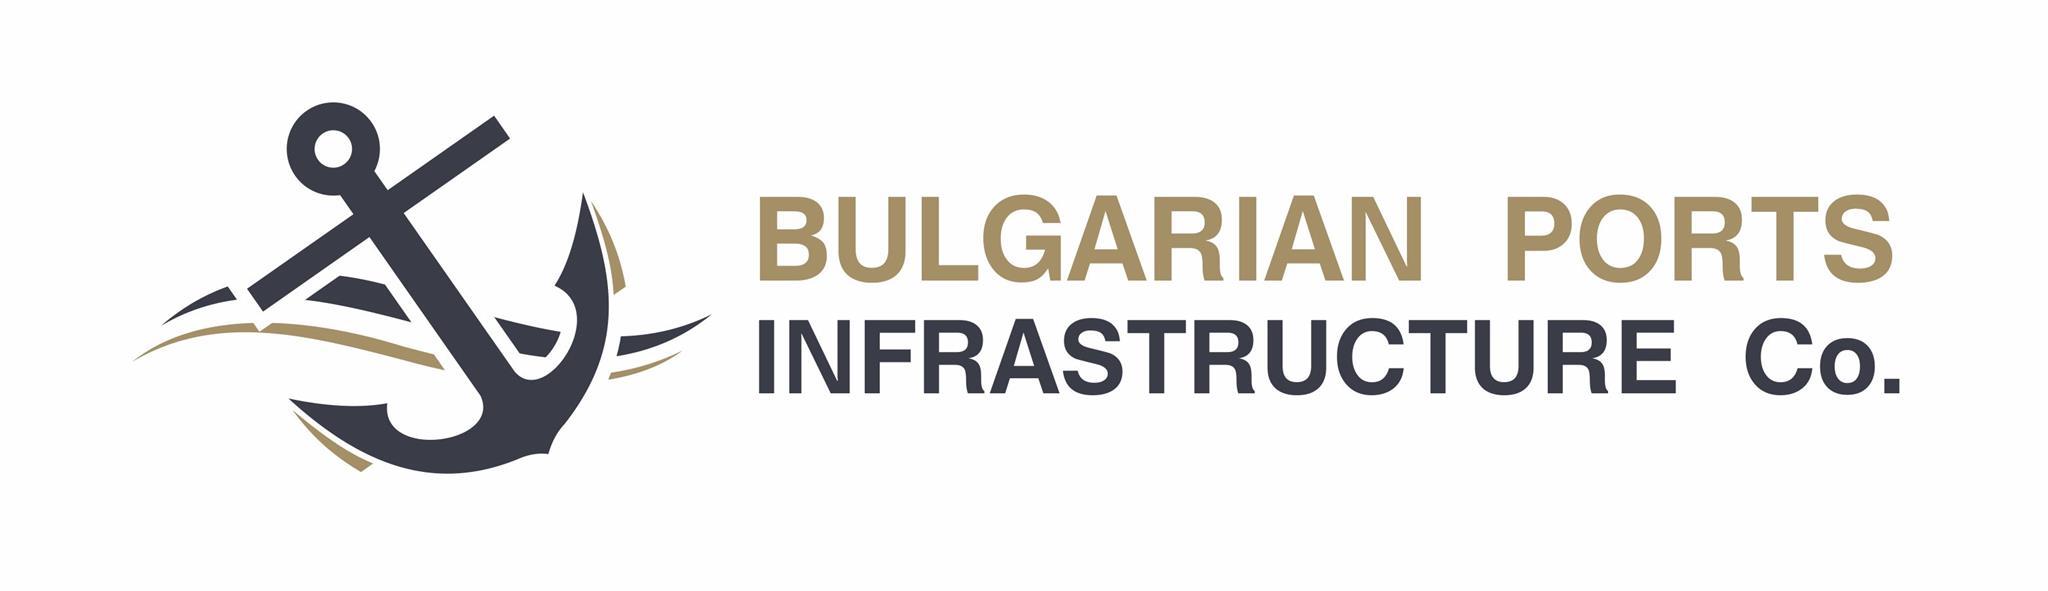 Bulgarian ports